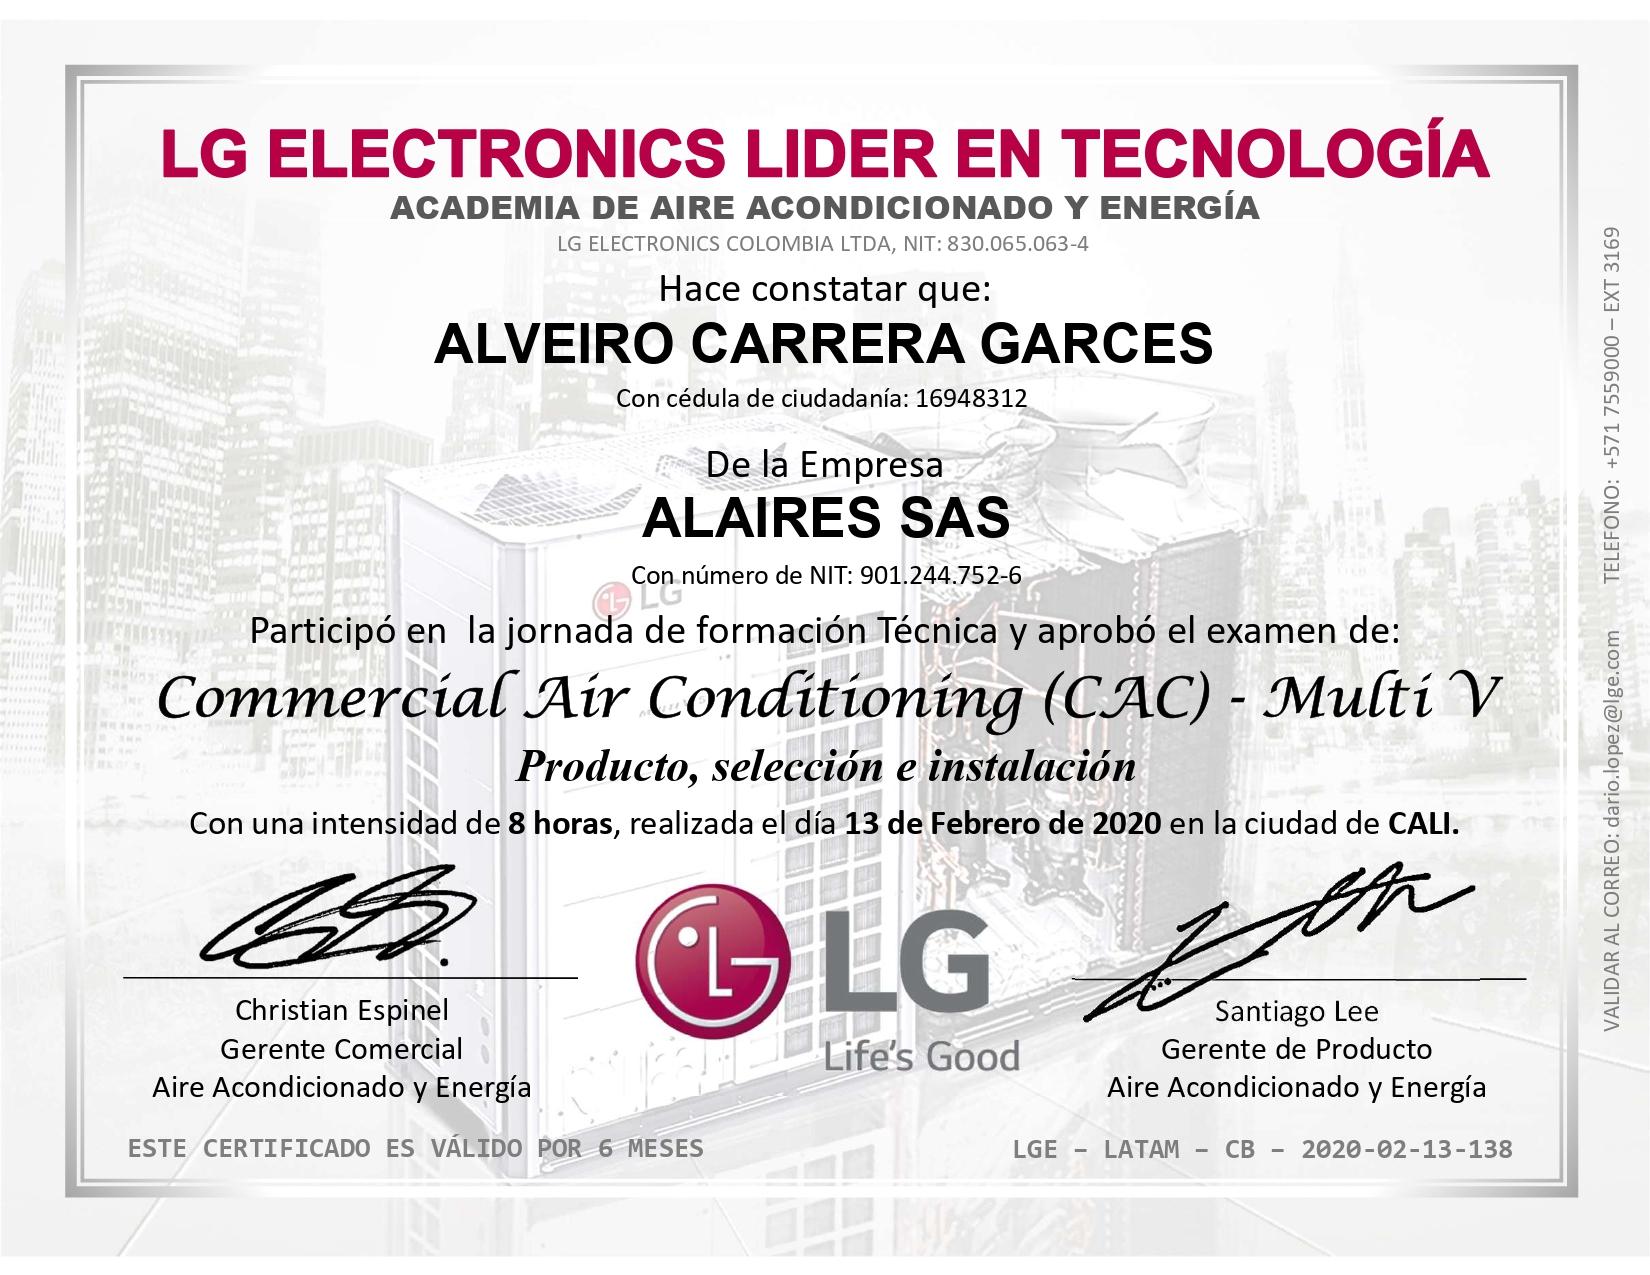 LGE-LATAM-CB-2020-02-13-138 ALVEIRO CARRERA GARCES_page-0001